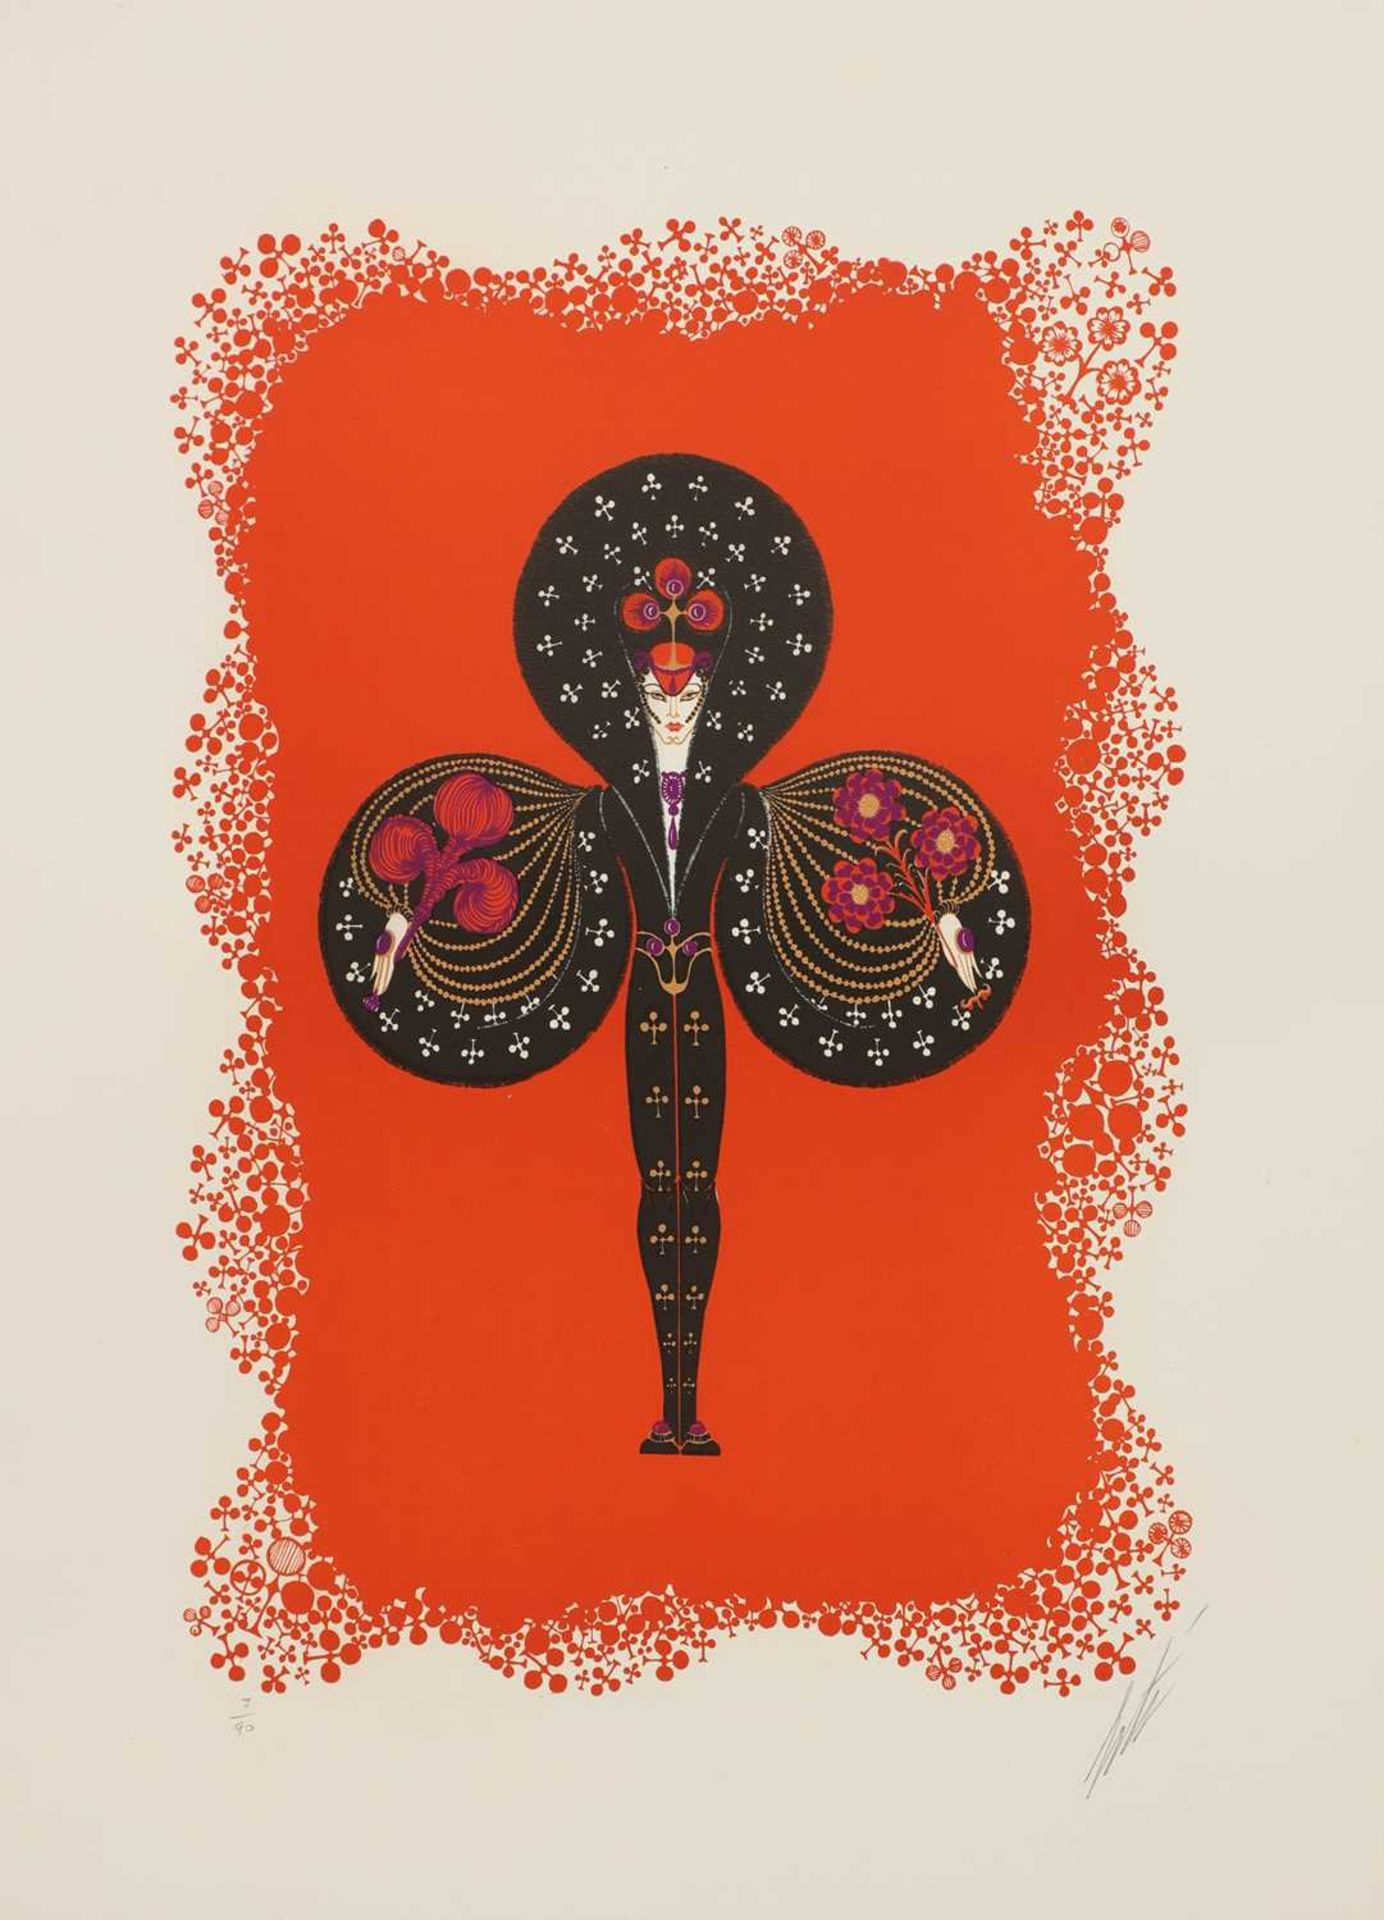 *'Erte' (Romain de Tirtoff) (Russian-French, 1892-1990) - Image 4 of 4